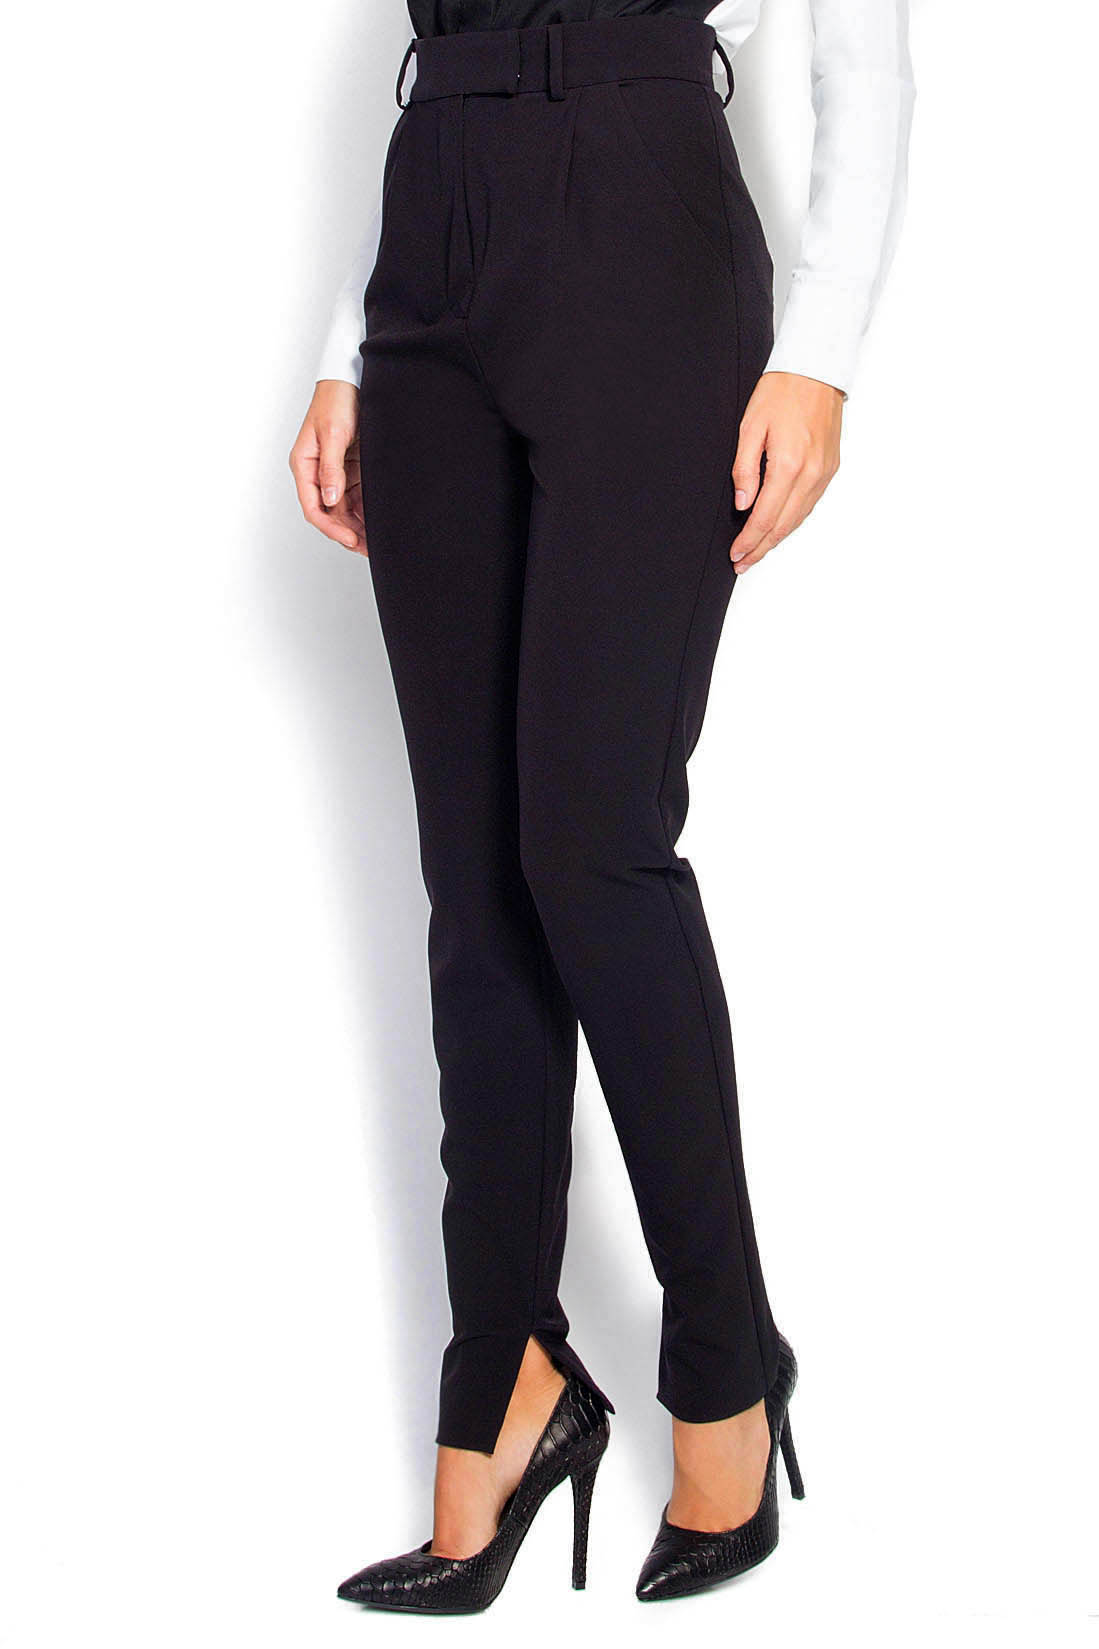 pantalon taille haute pantalons droits pantalons sur mesure. Black Bedroom Furniture Sets. Home Design Ideas